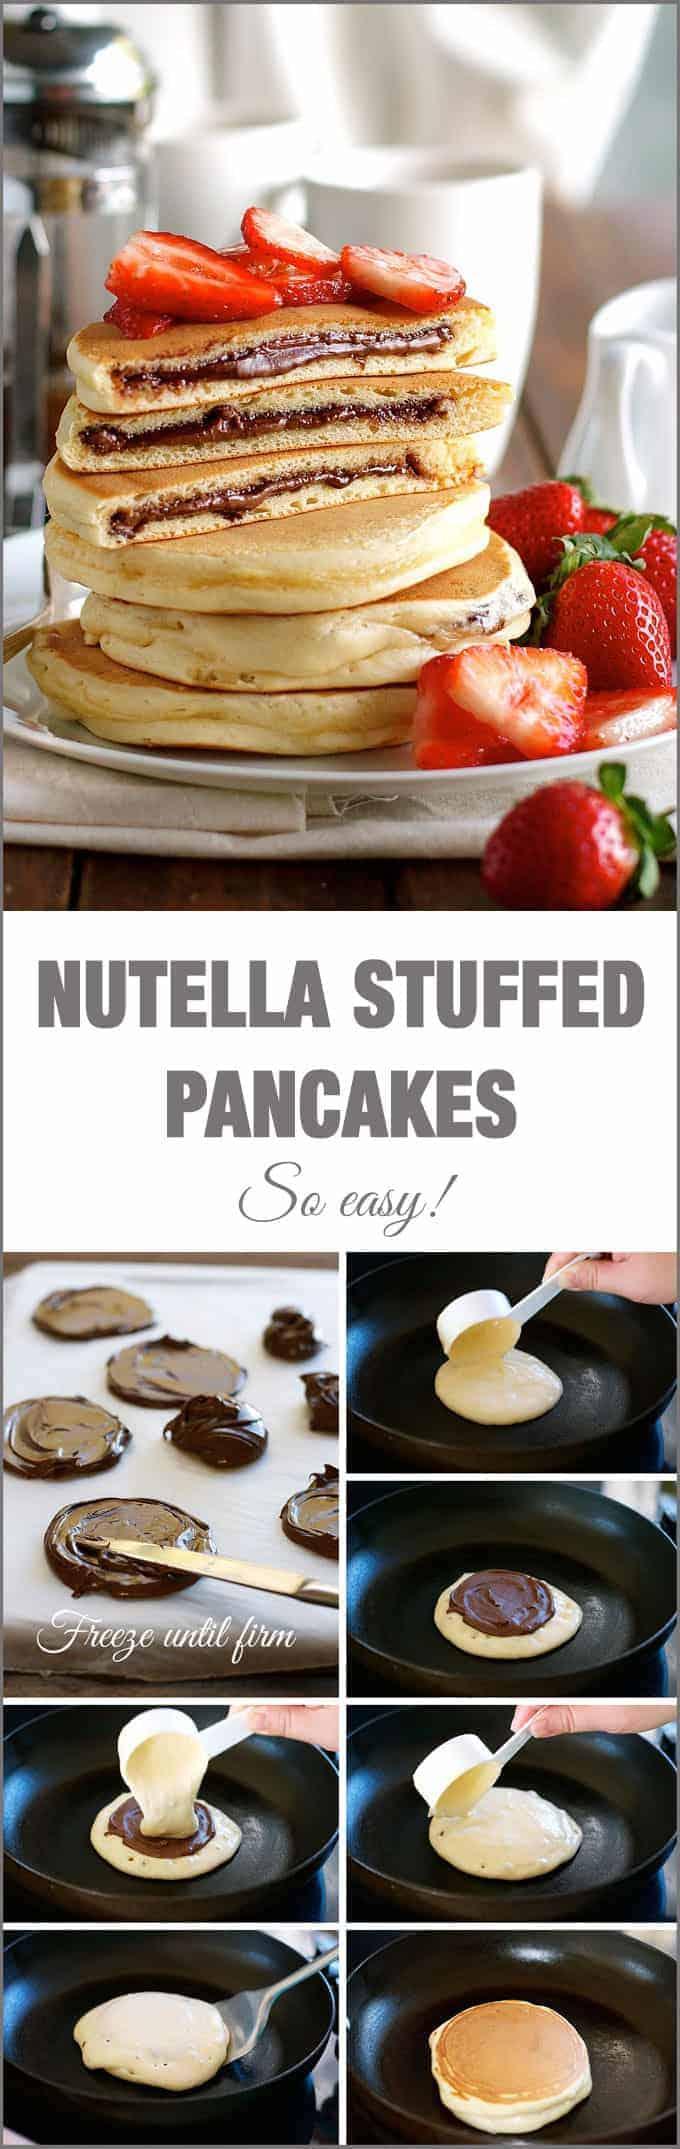 Nutella Stuffed Pancakes - frozen Nutella discs makes it a breeze to ...